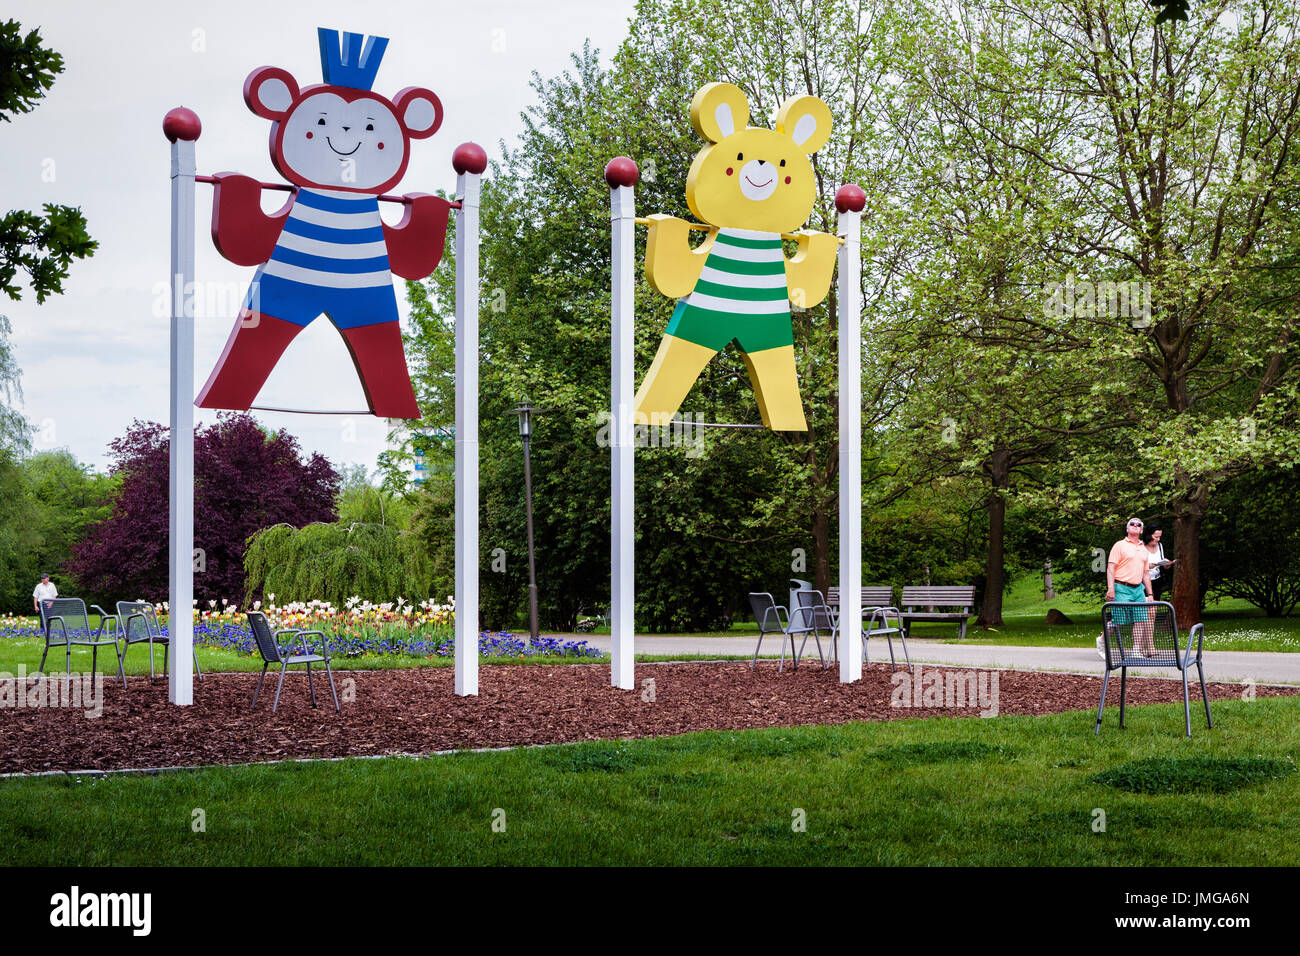 Berlin,Marzahn. Gardens of the World botanic garden,Gärten der Welt, amusing swings, Teddy bear cut-outs in Striped costumes for swinging - Stock Image